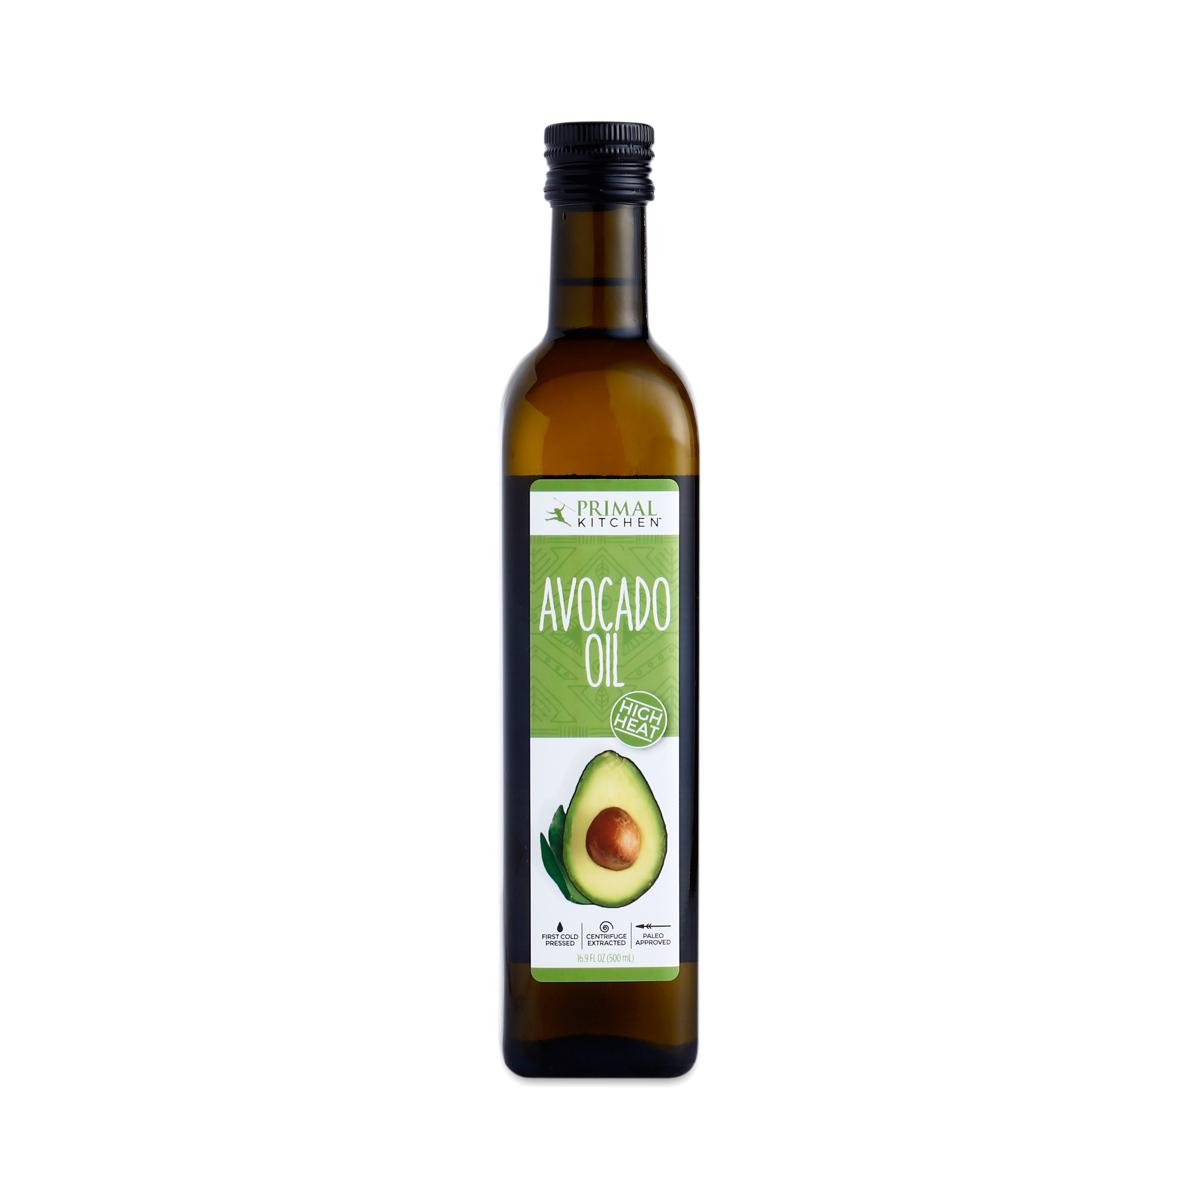 Avocado Oil By Primal Kitchen Thrive Market